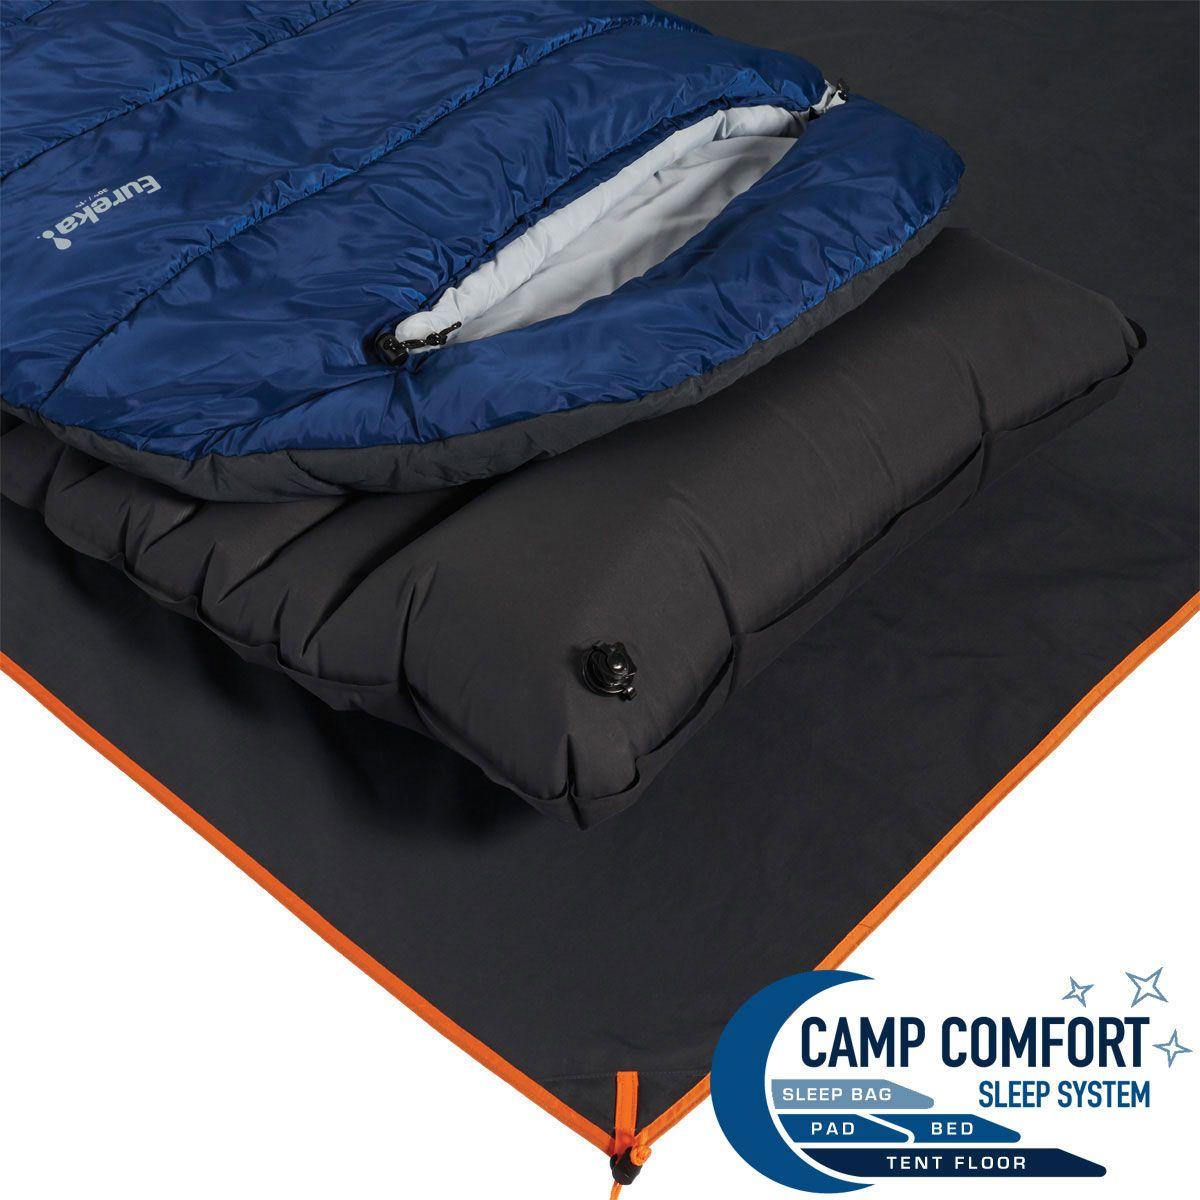 Camp Comfort™ Tent Floor 6P Rectangular Eureka! Tent